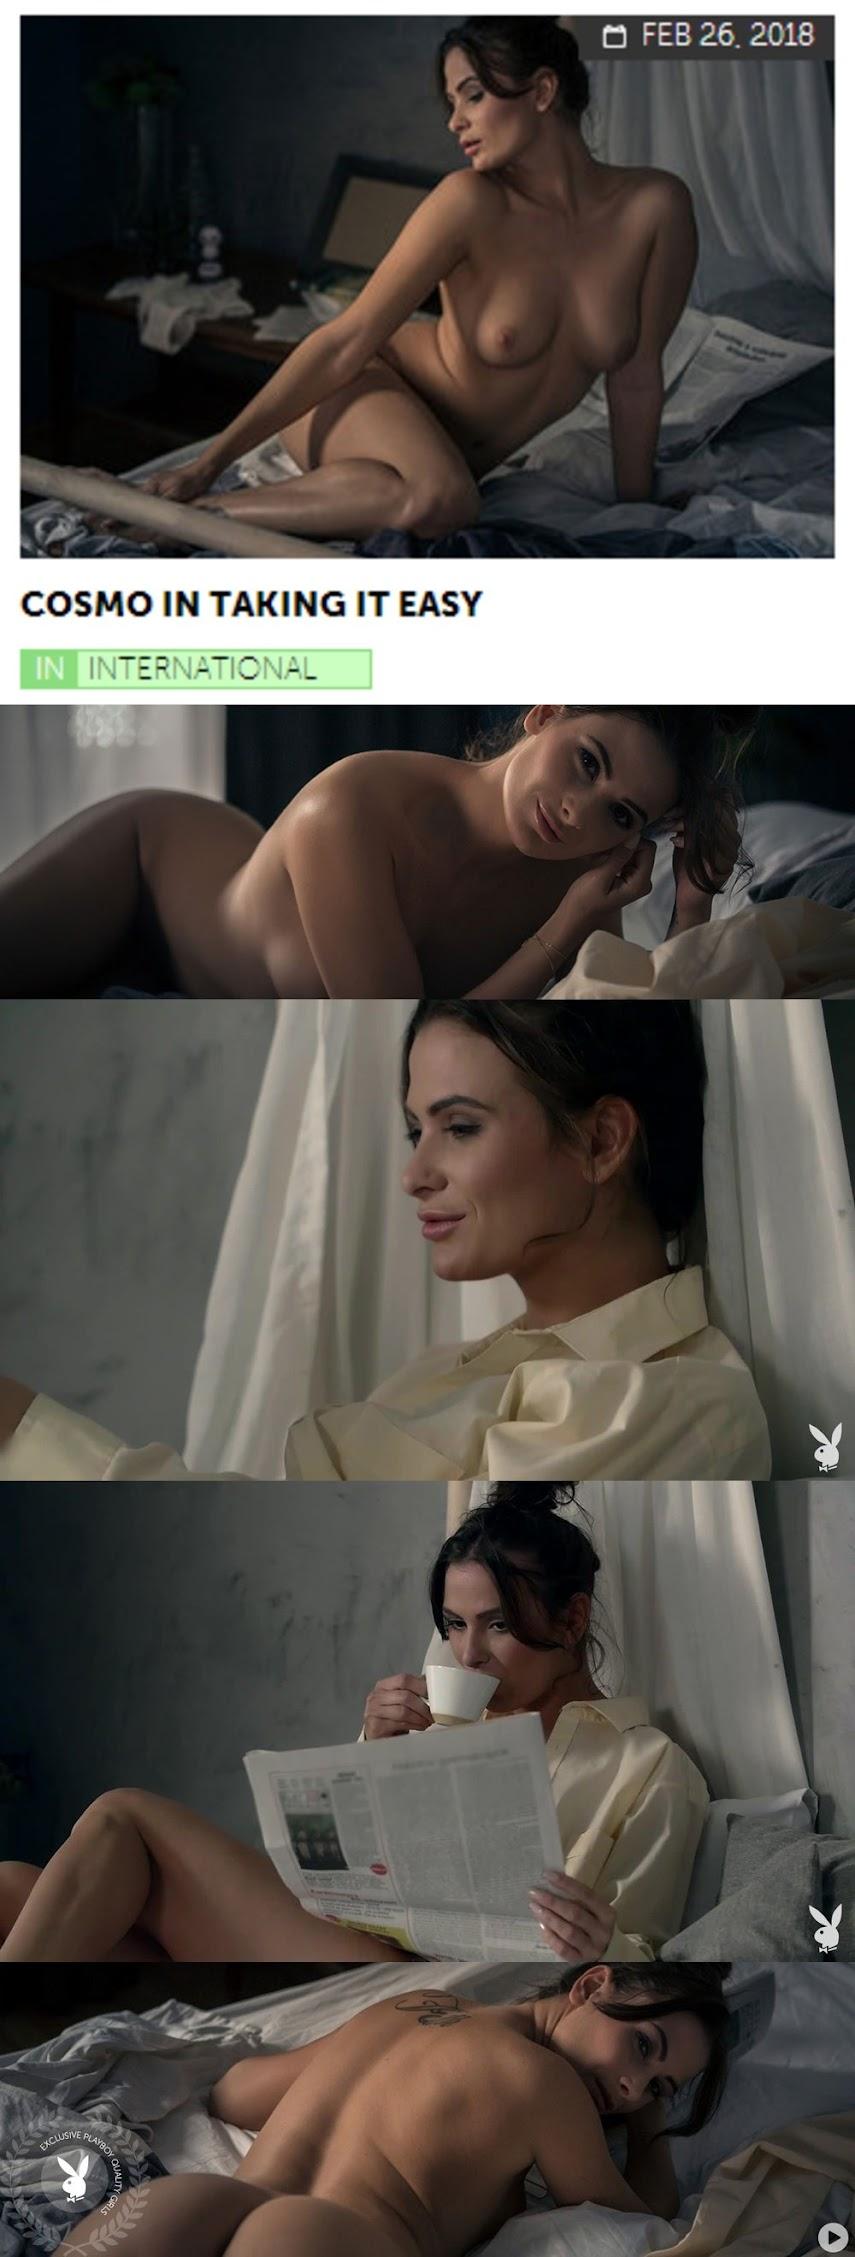 Playboy PlayboyPlus2018-02-26 Cosmo in Taking it Easy